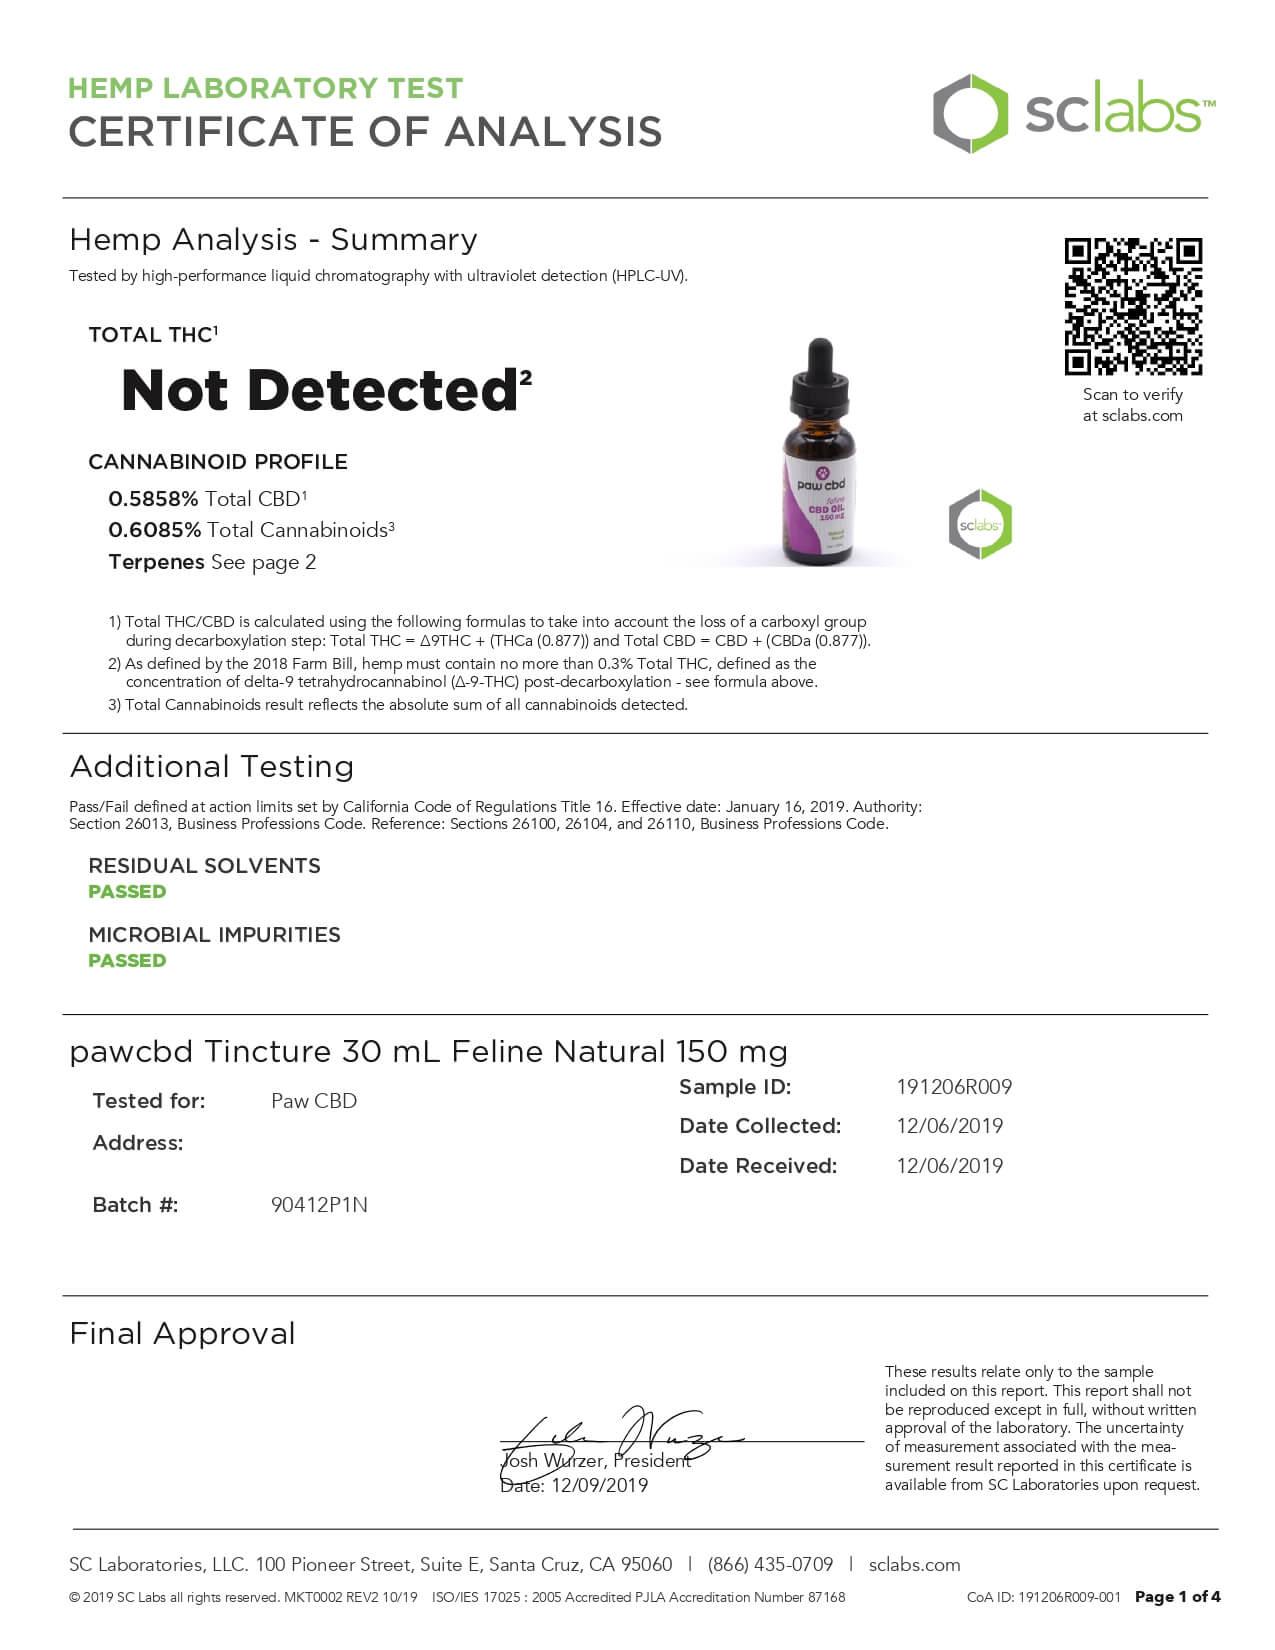 cbdMD CBD Pet Tincture Natural Flavored Feline 150mg Lab Report